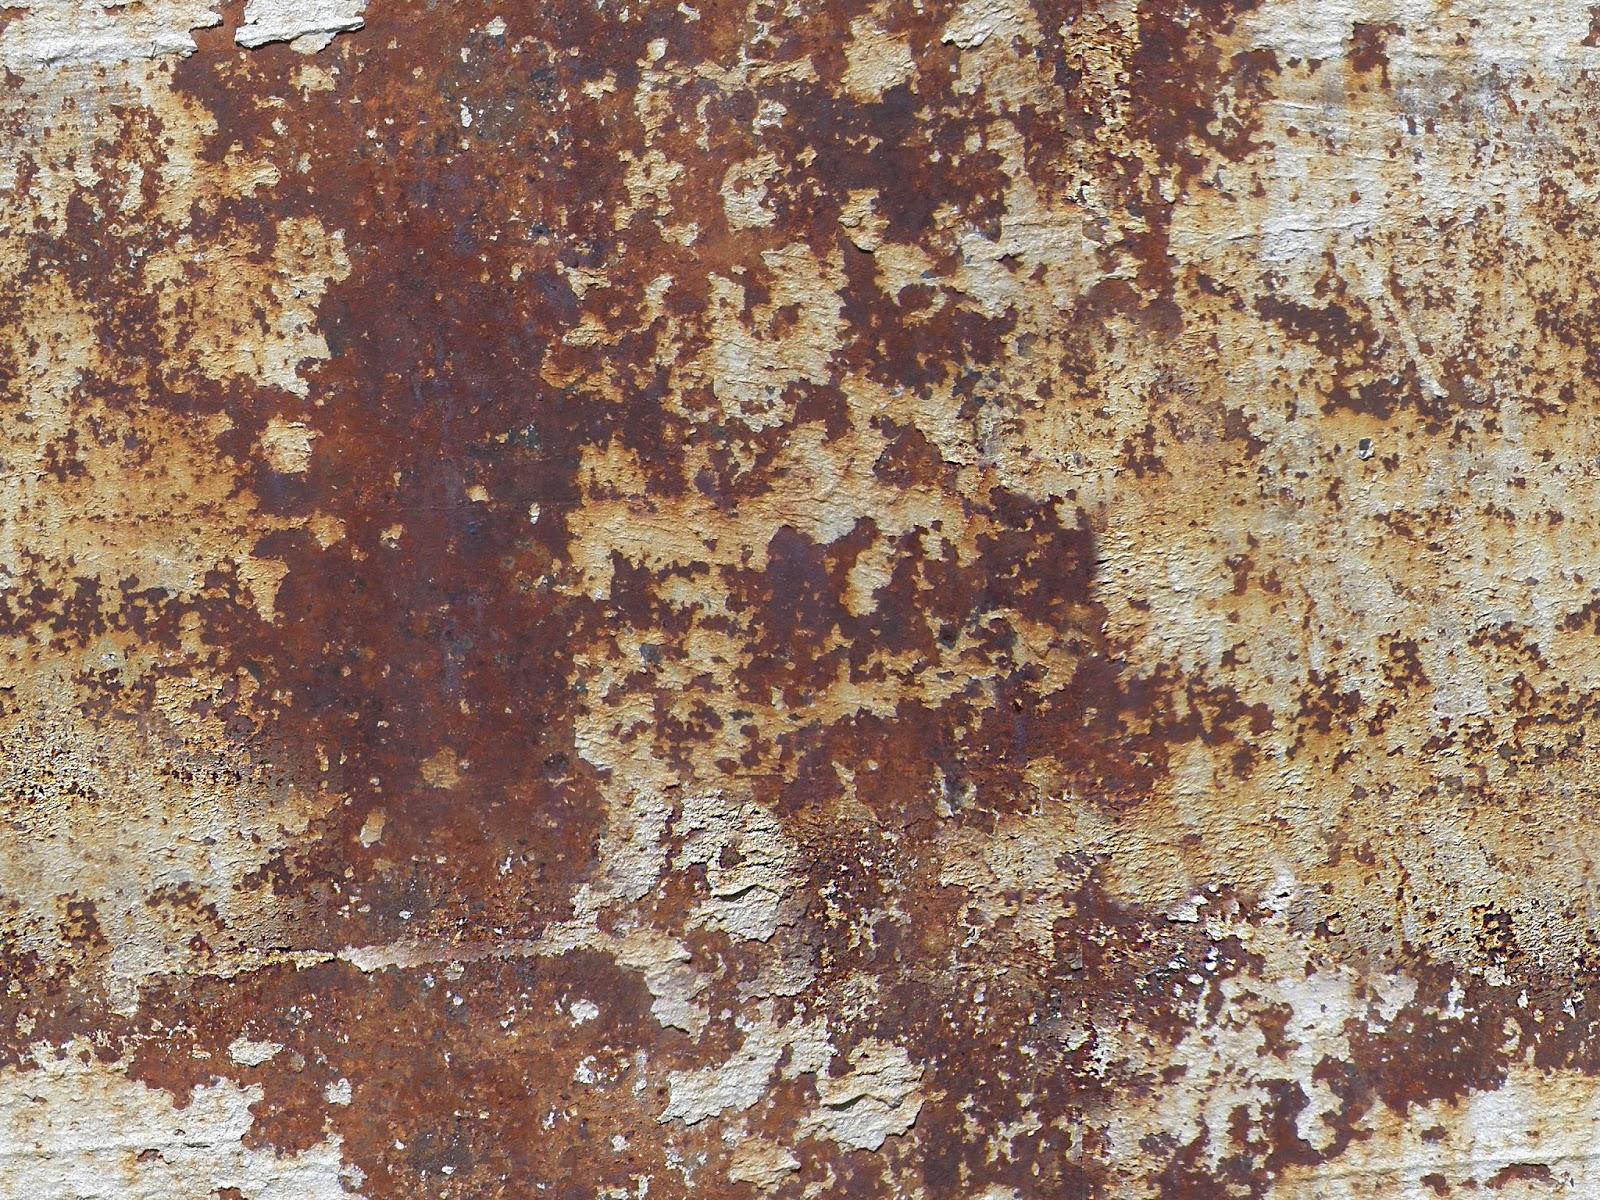 Seamless Rust Metal + (Maps) | Texturise Free Seamless ...  Seamless Rust M...